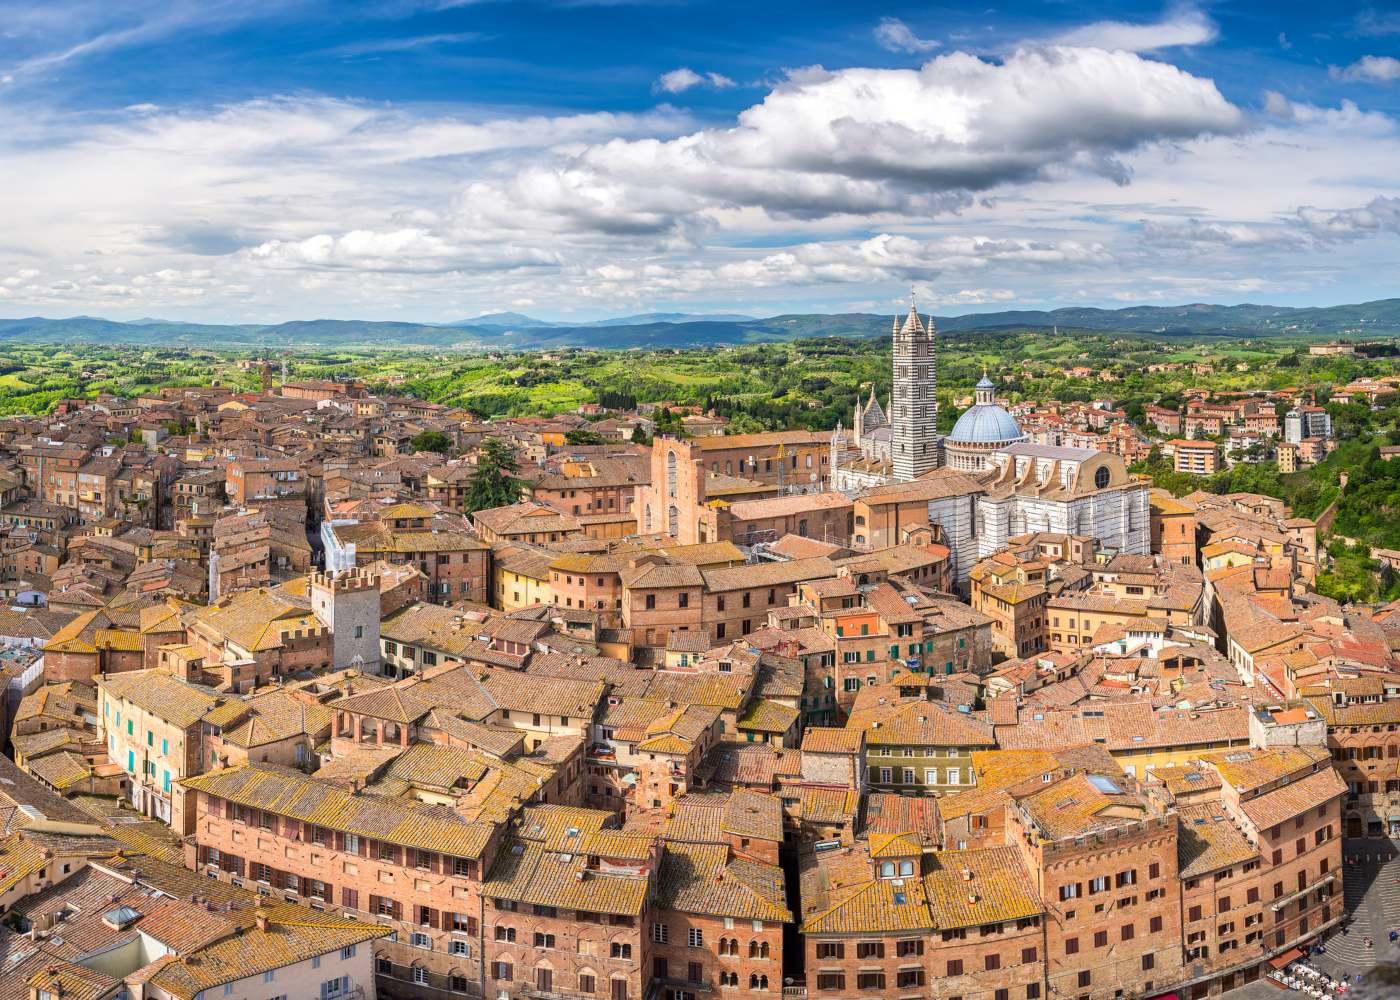 Vista aérea de Siena